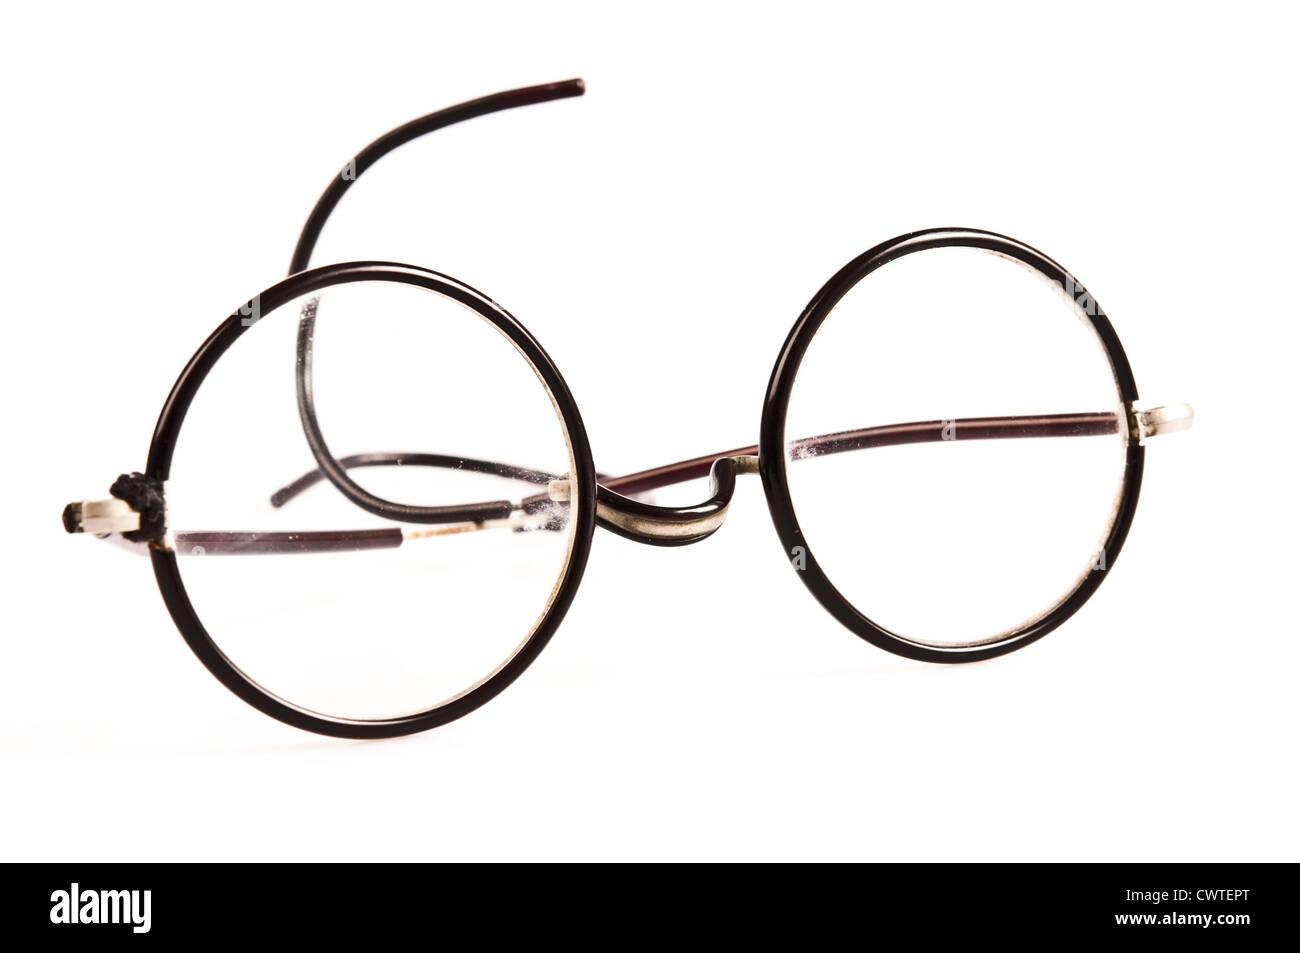 2f8dbbafba095 antique round reading glasses Stock Photo  50325600 - Alamy